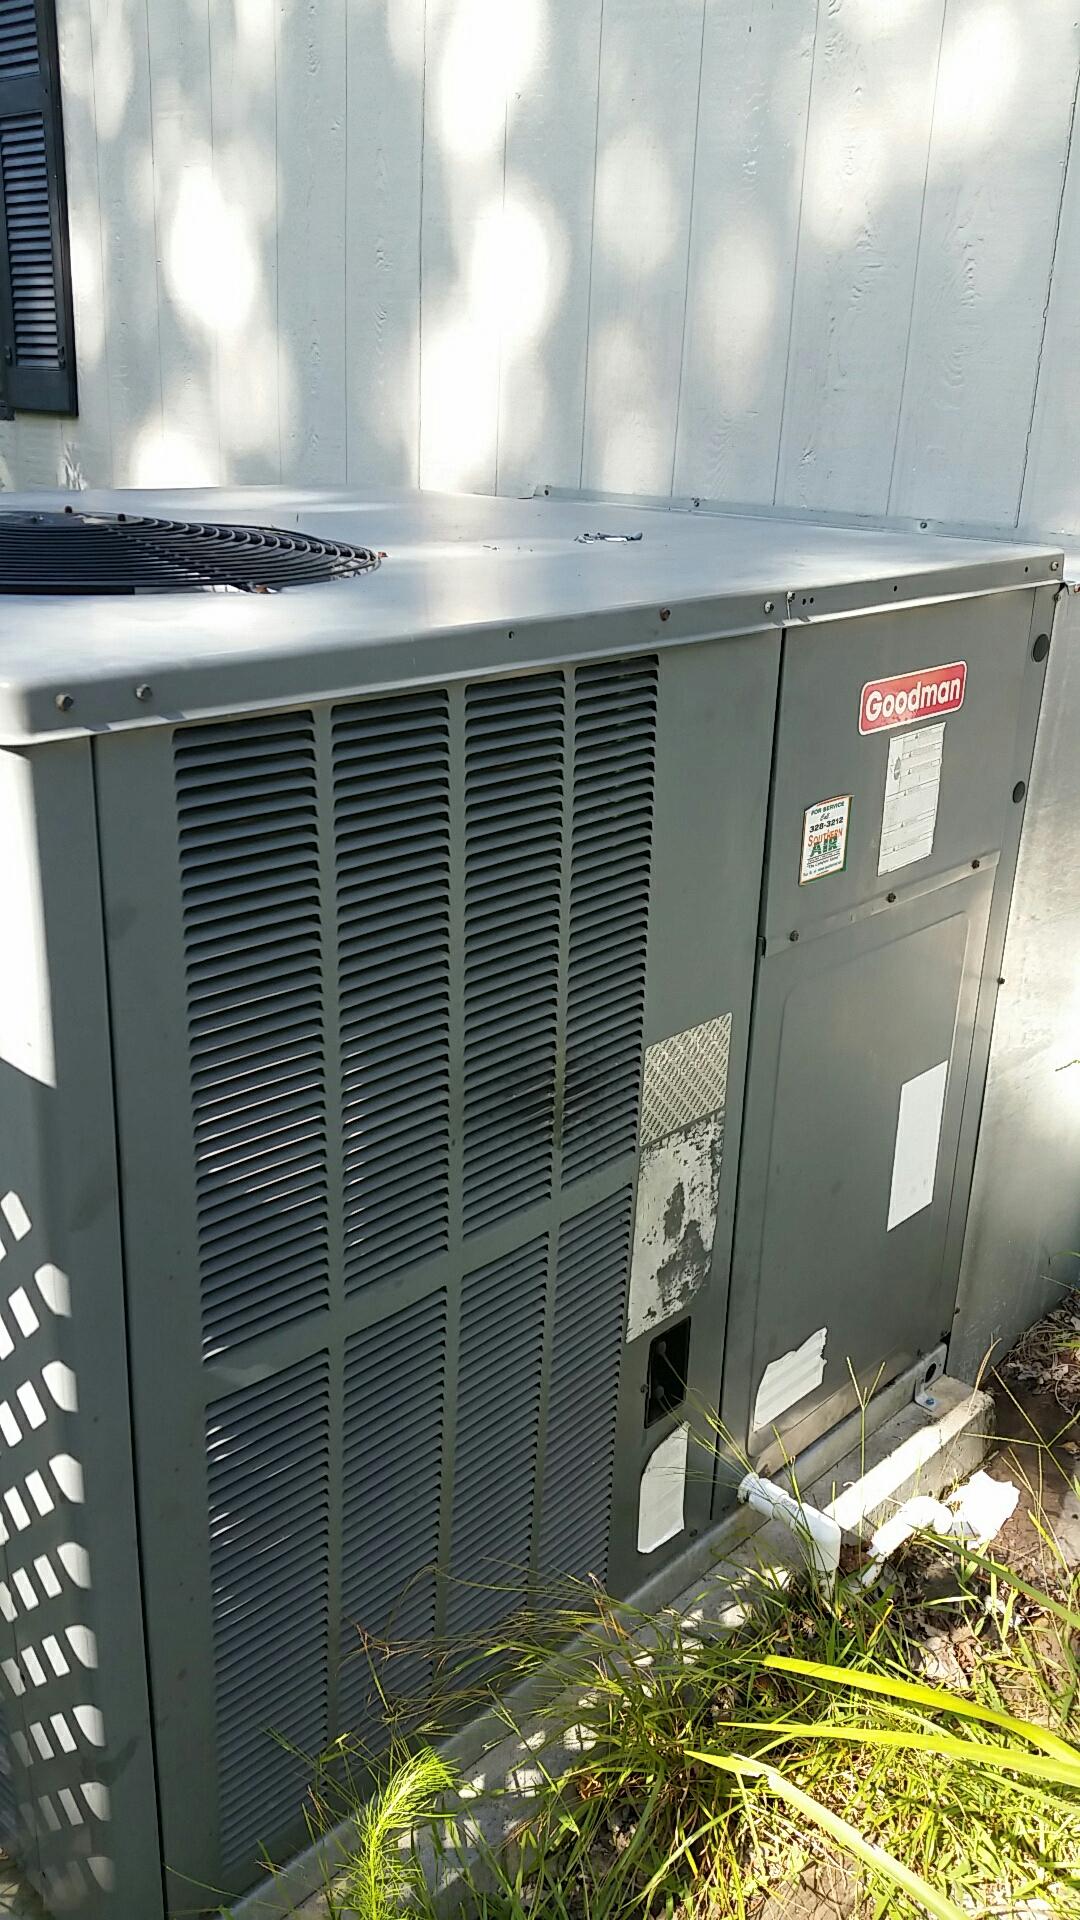 San Mateo, FL - Service call on Goodman package heat pump system